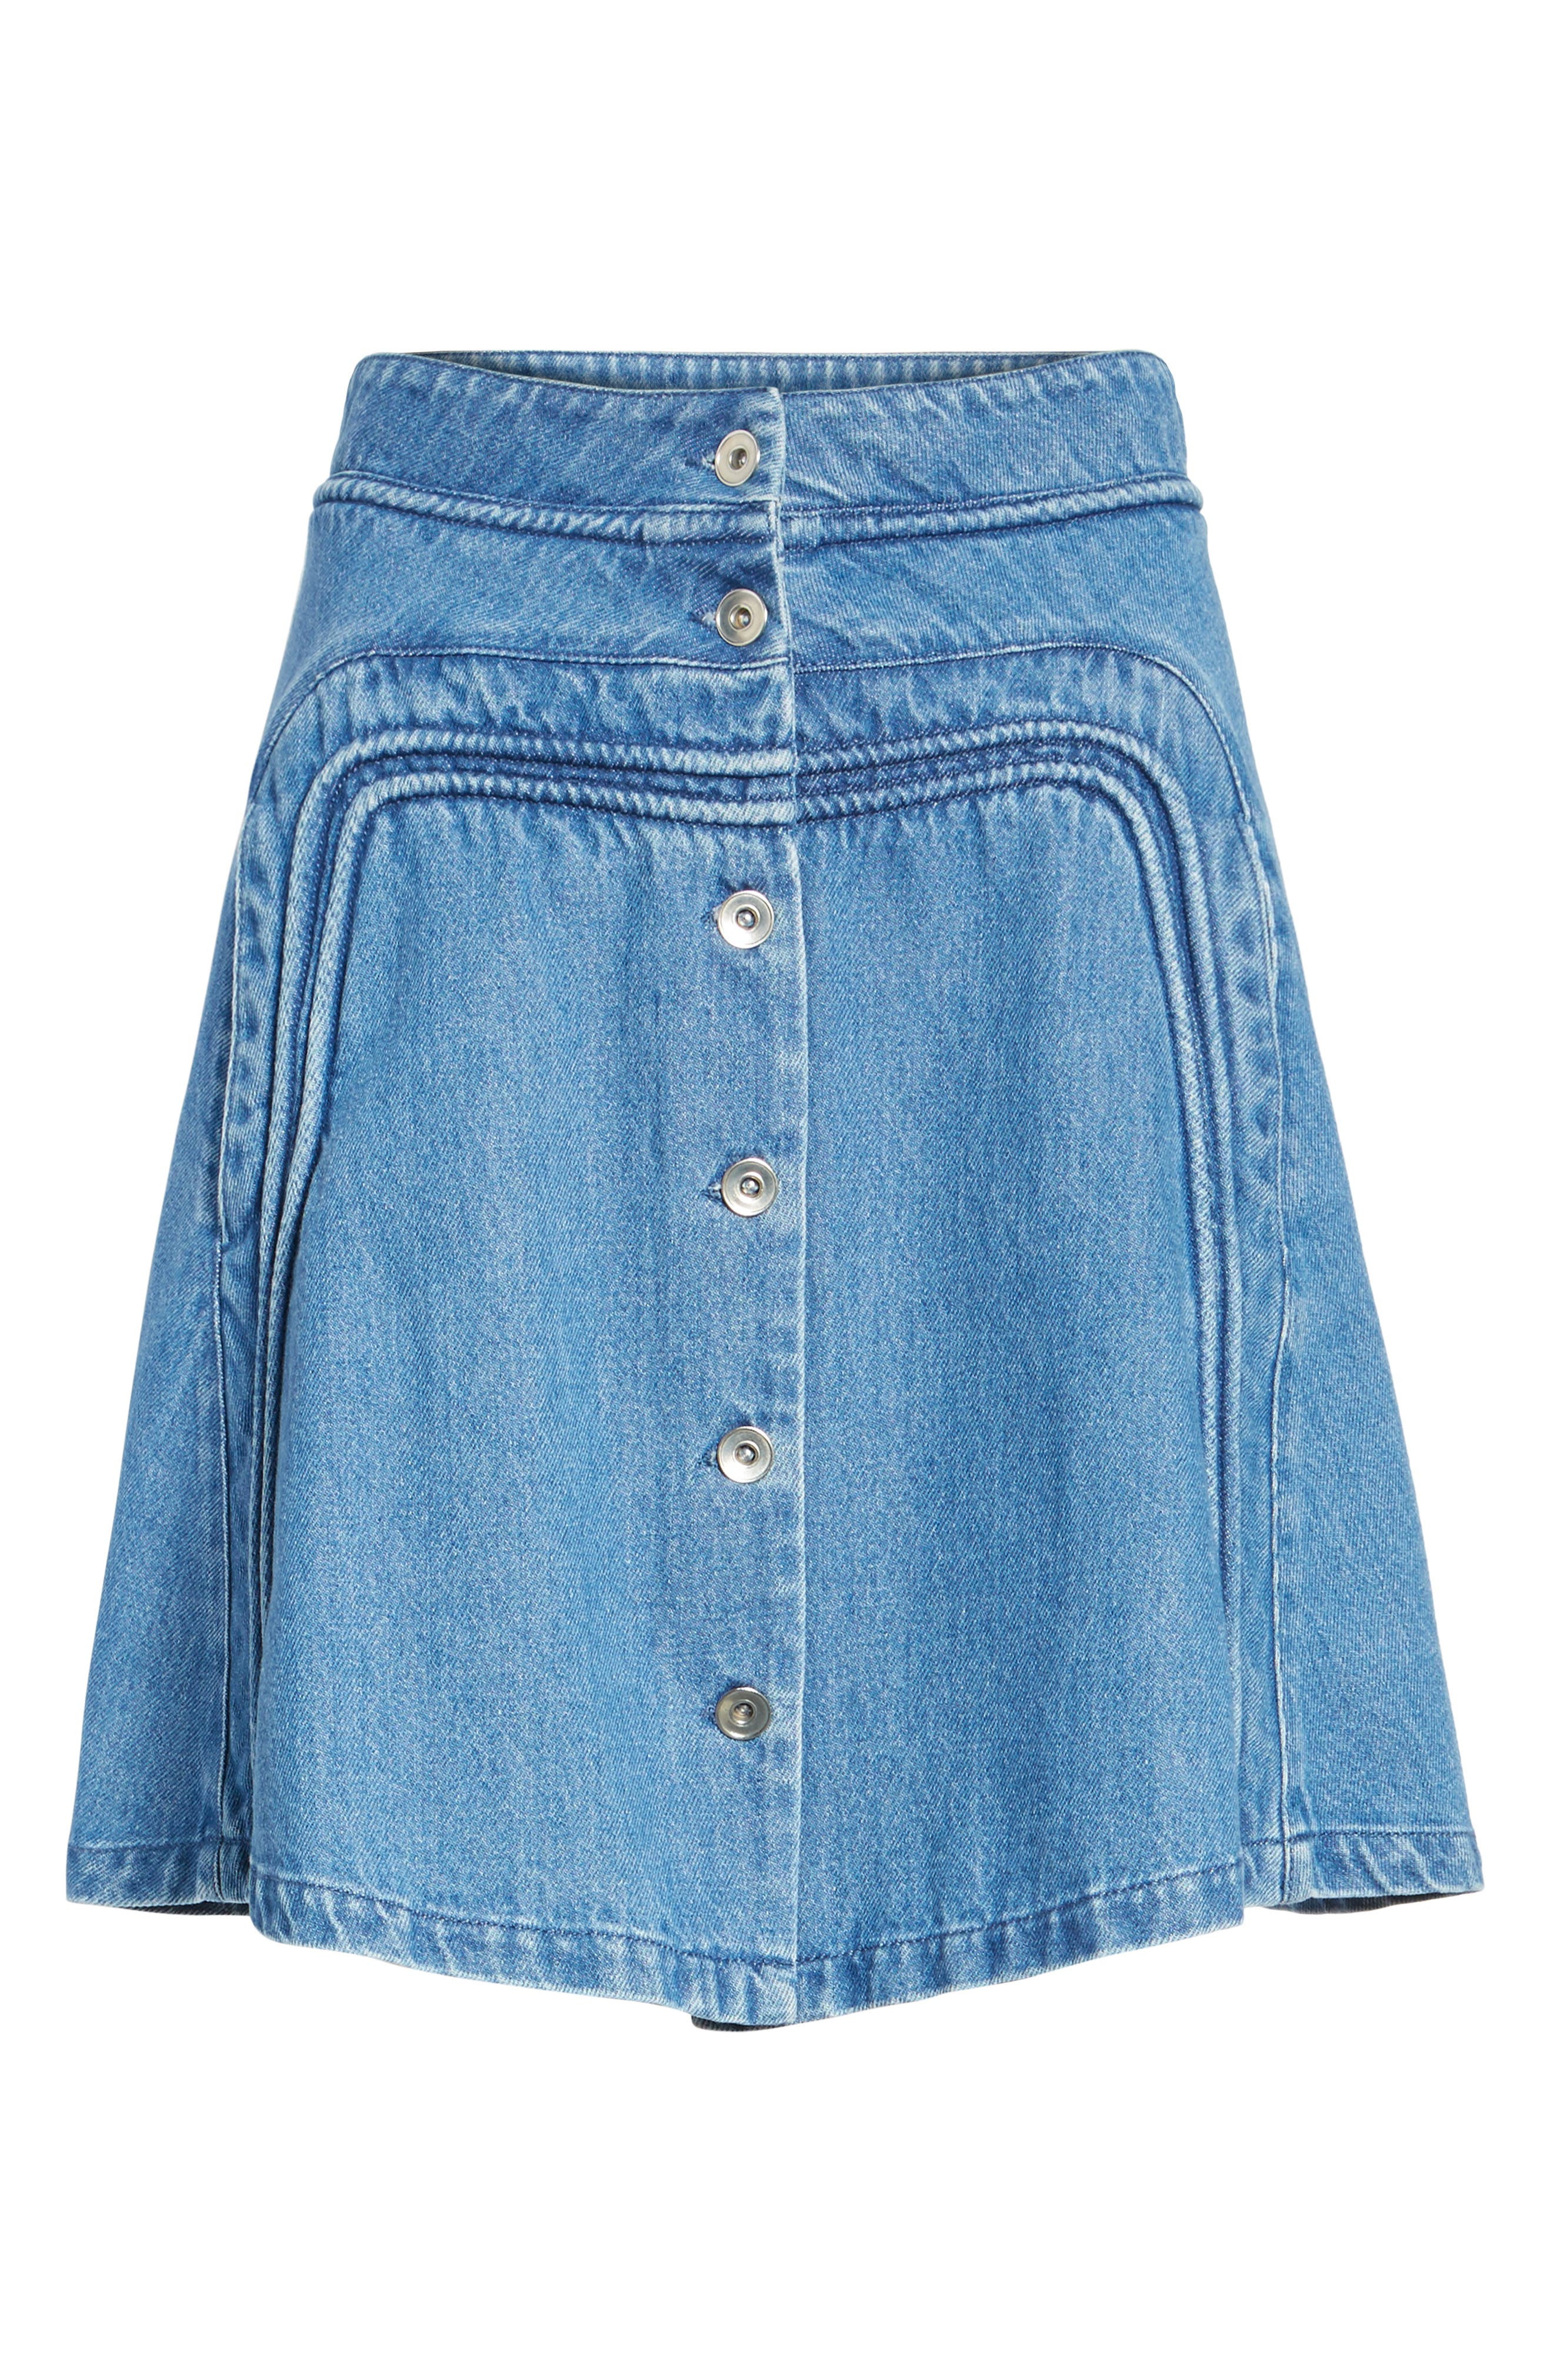 A-Line Skirt,                             Alternate thumbnail 6, color,                             401